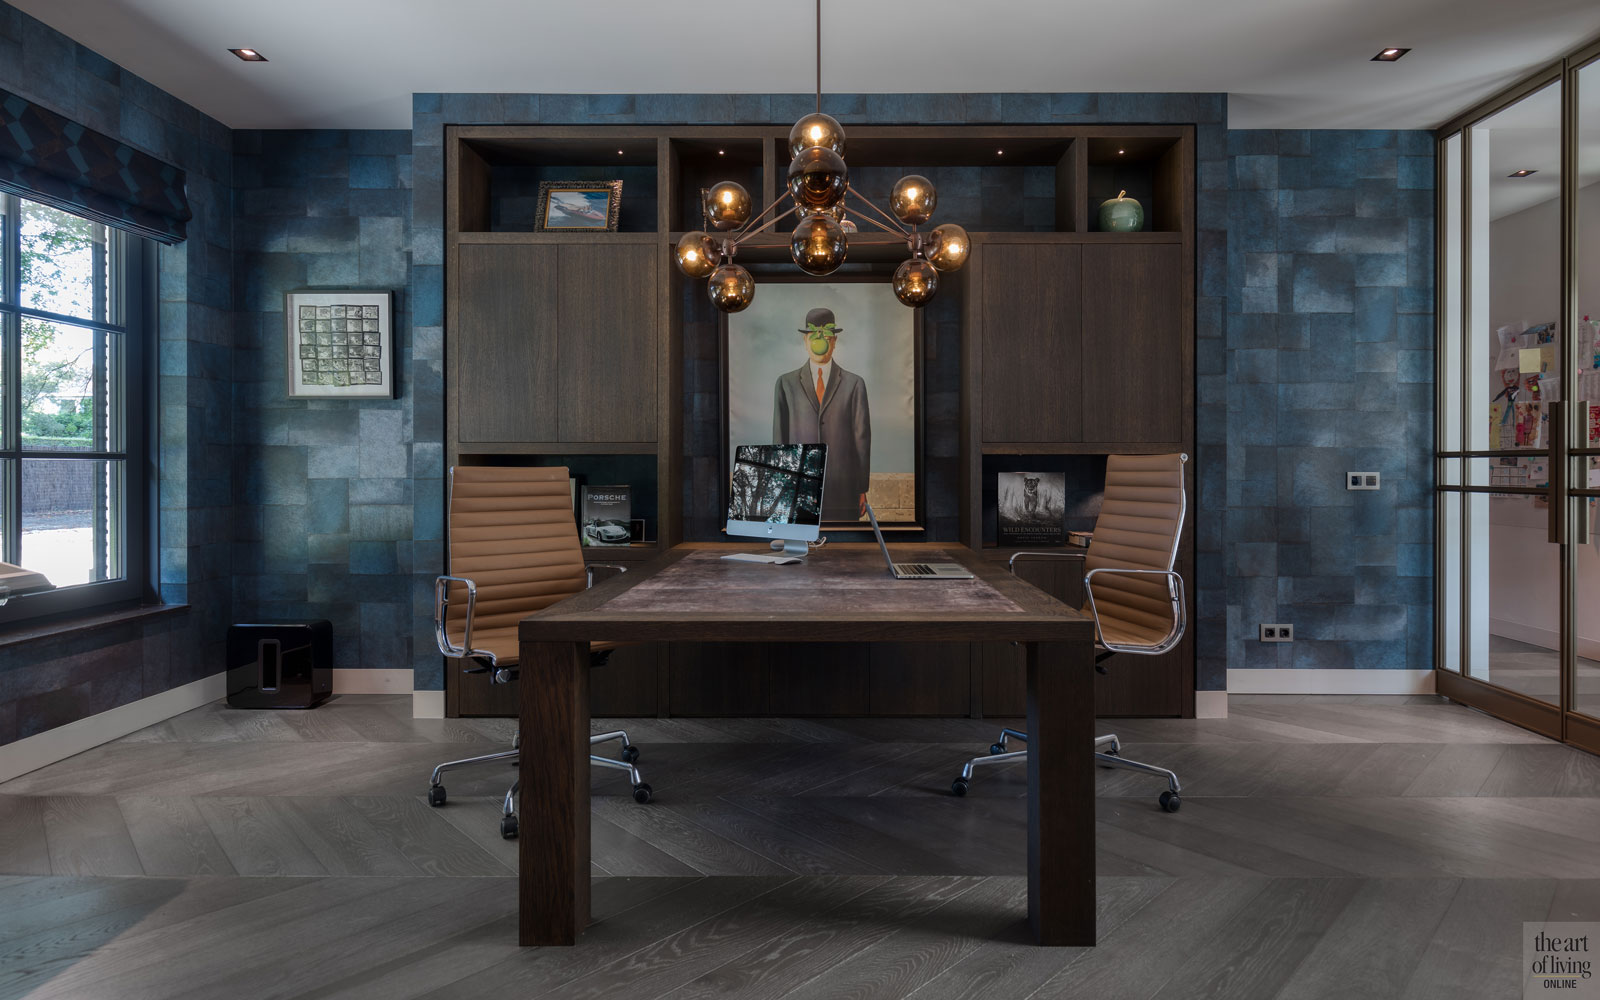 High end interieur, Herman Peters, Kantoor, Home office, maatwerk interieur, Verlichting, Design verlichting, verlichting armatuur